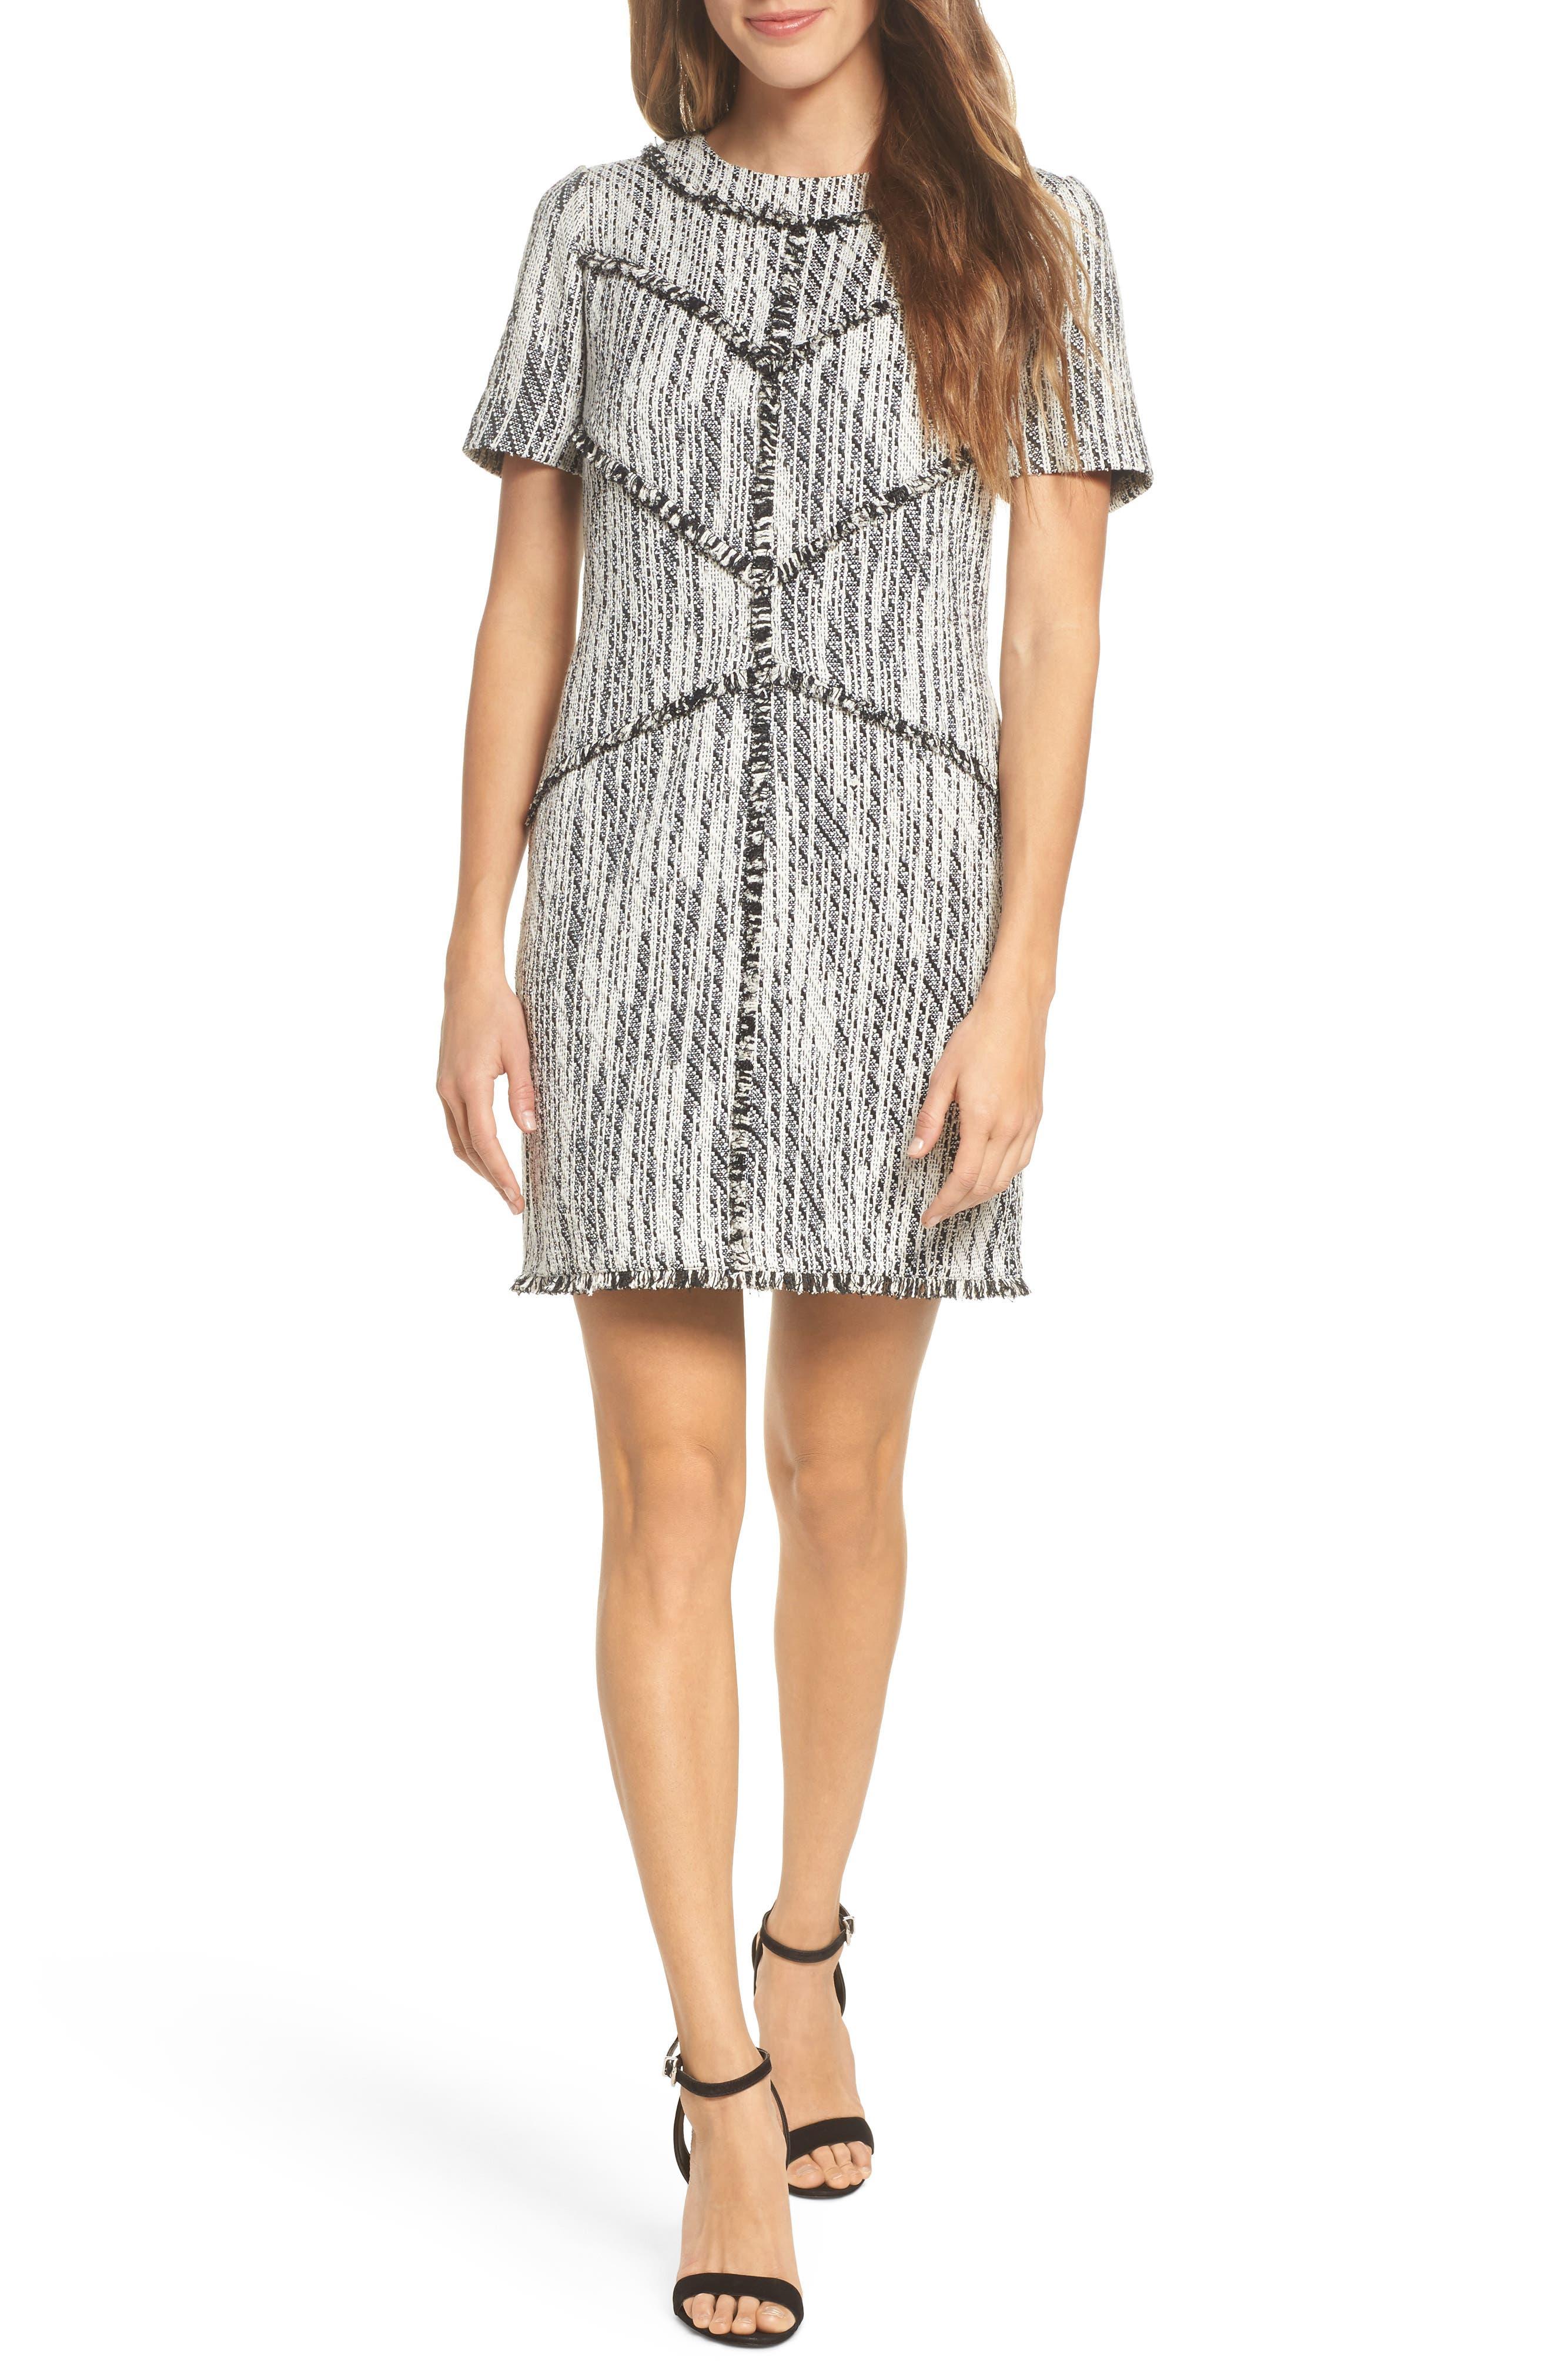 Dolce Vita Tweed Shift Dress,                         Main,                         color, Black/ Ivory Tweed